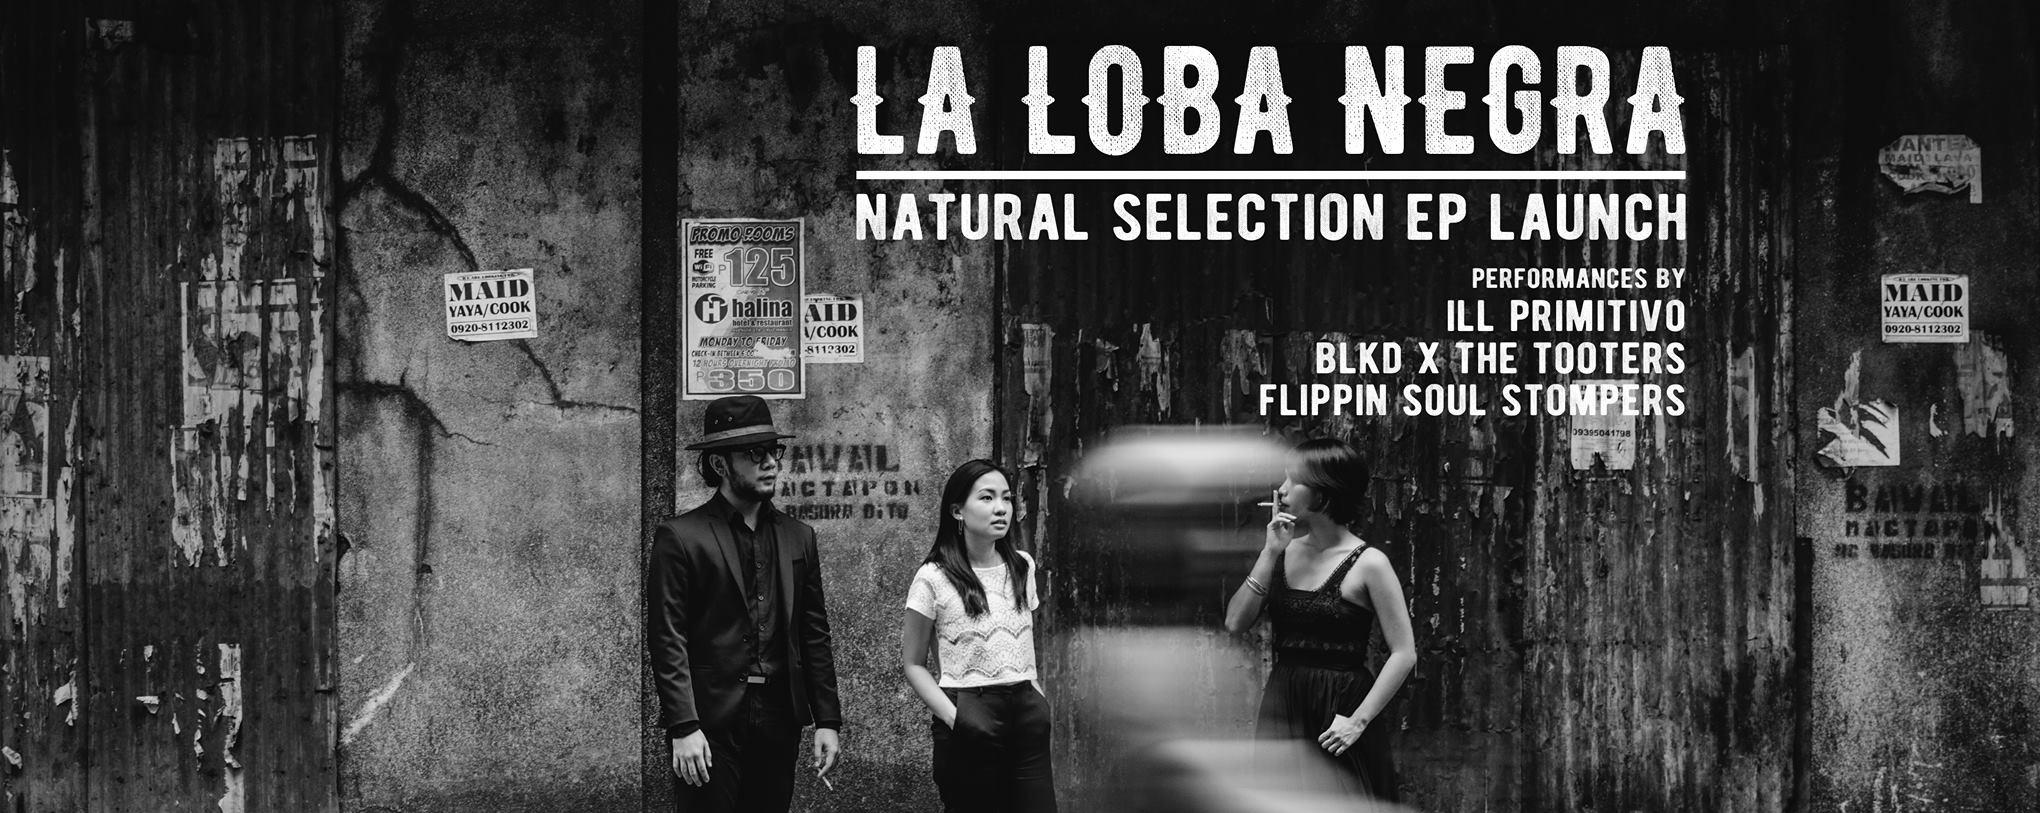 La Loba Negra EP Launch